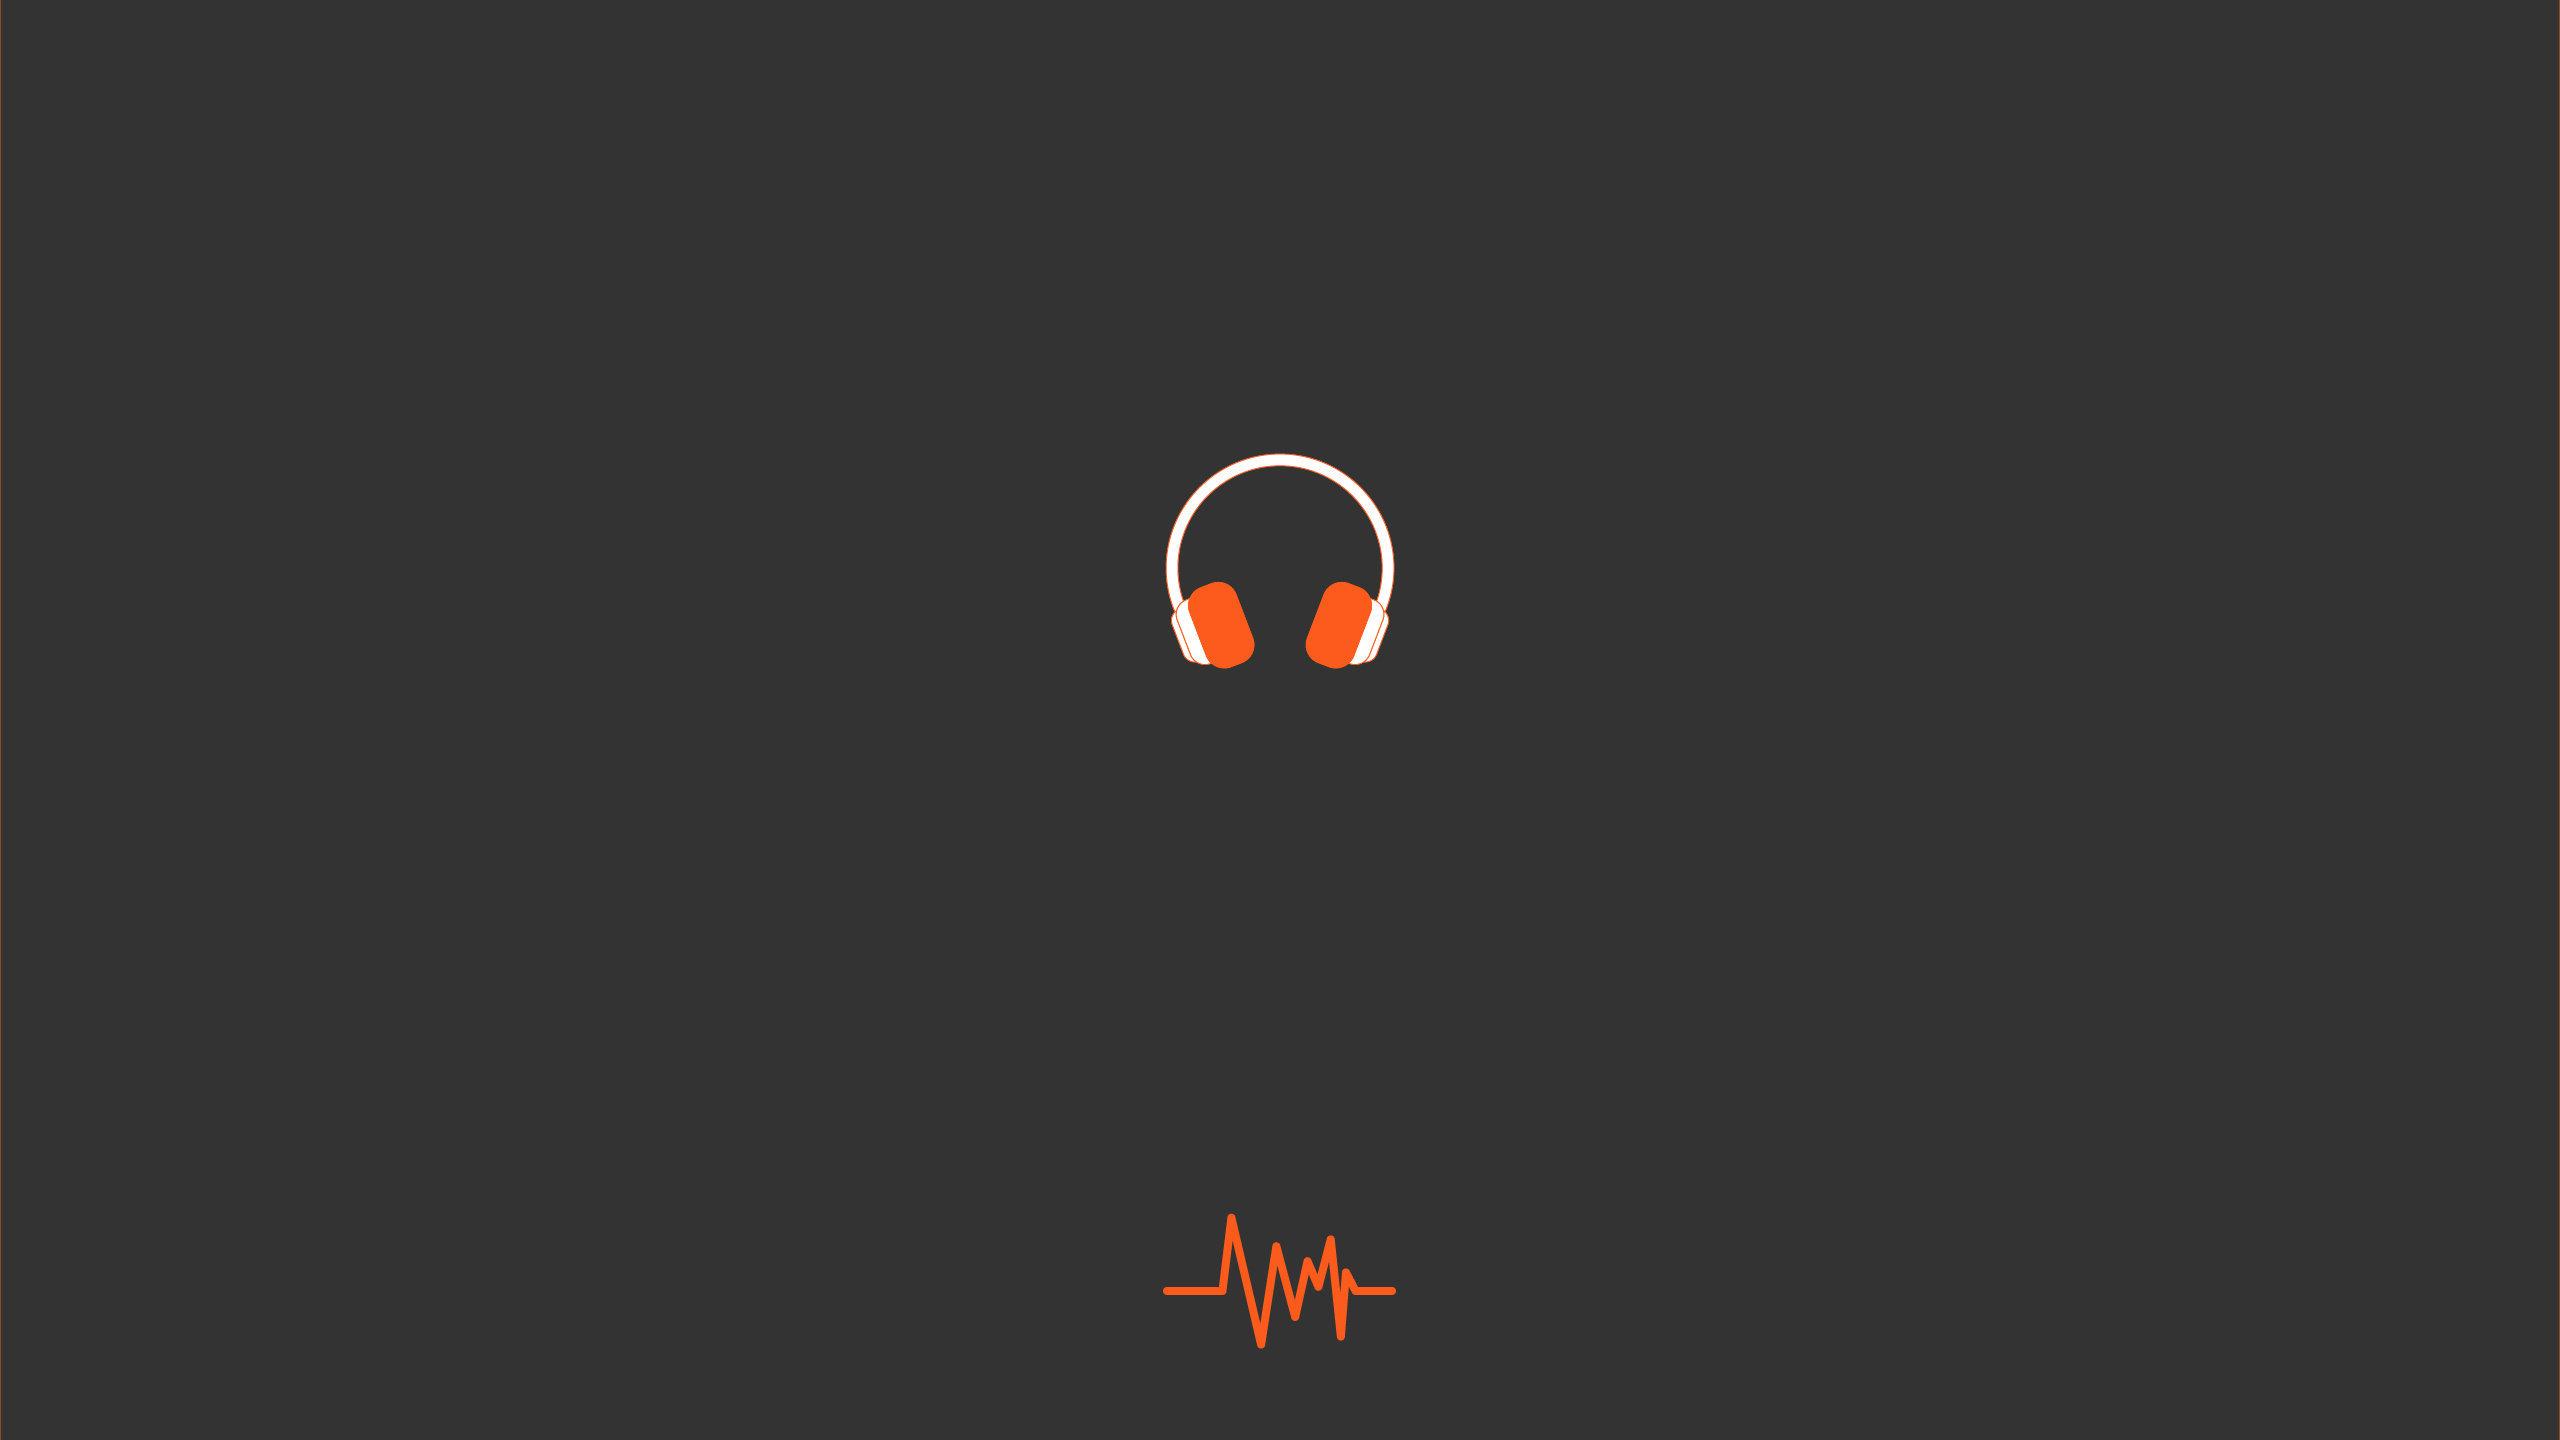 Darth Vader Wallpaper Hd Minimal Headphones Wallpaper Fundjstuff Com